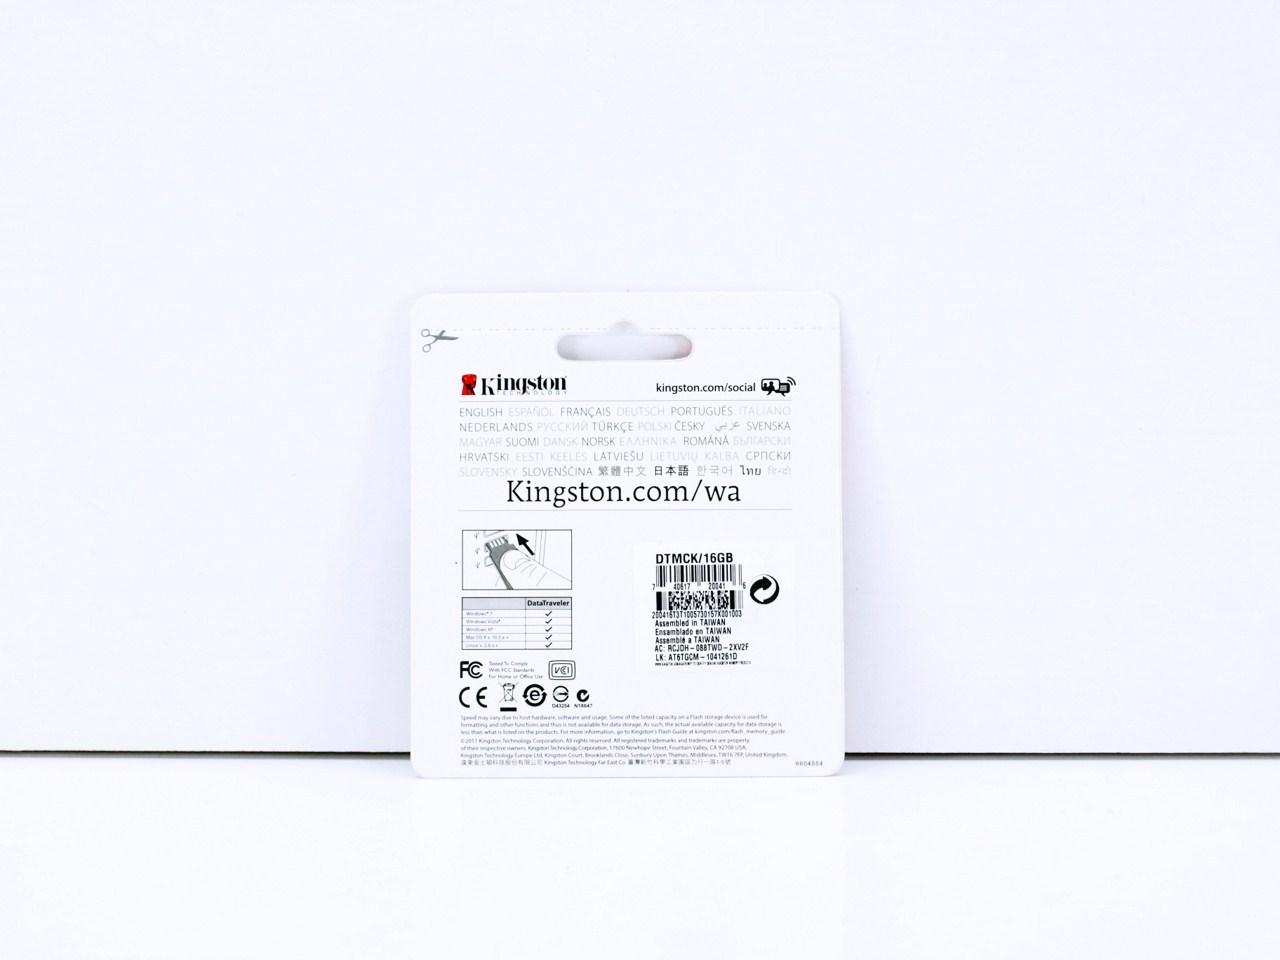 kingston datatraveler micro 16gb usb 2 0 flash drive review. Black Bedroom Furniture Sets. Home Design Ideas